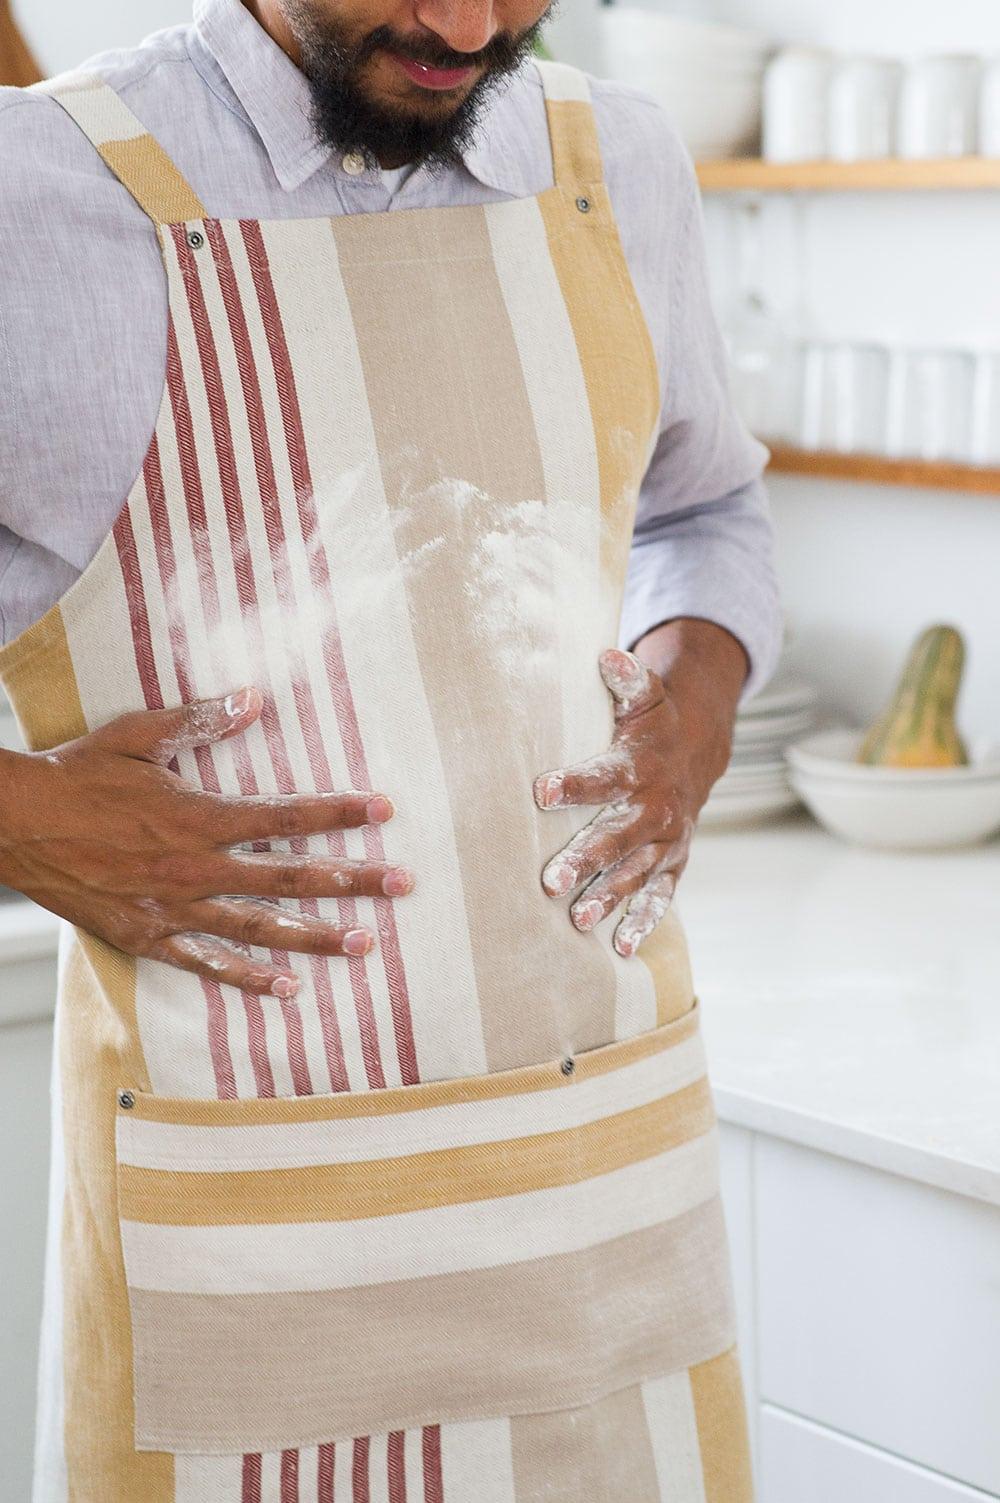 Mungo Chef's Apron in Yam, in a kitchen scene.